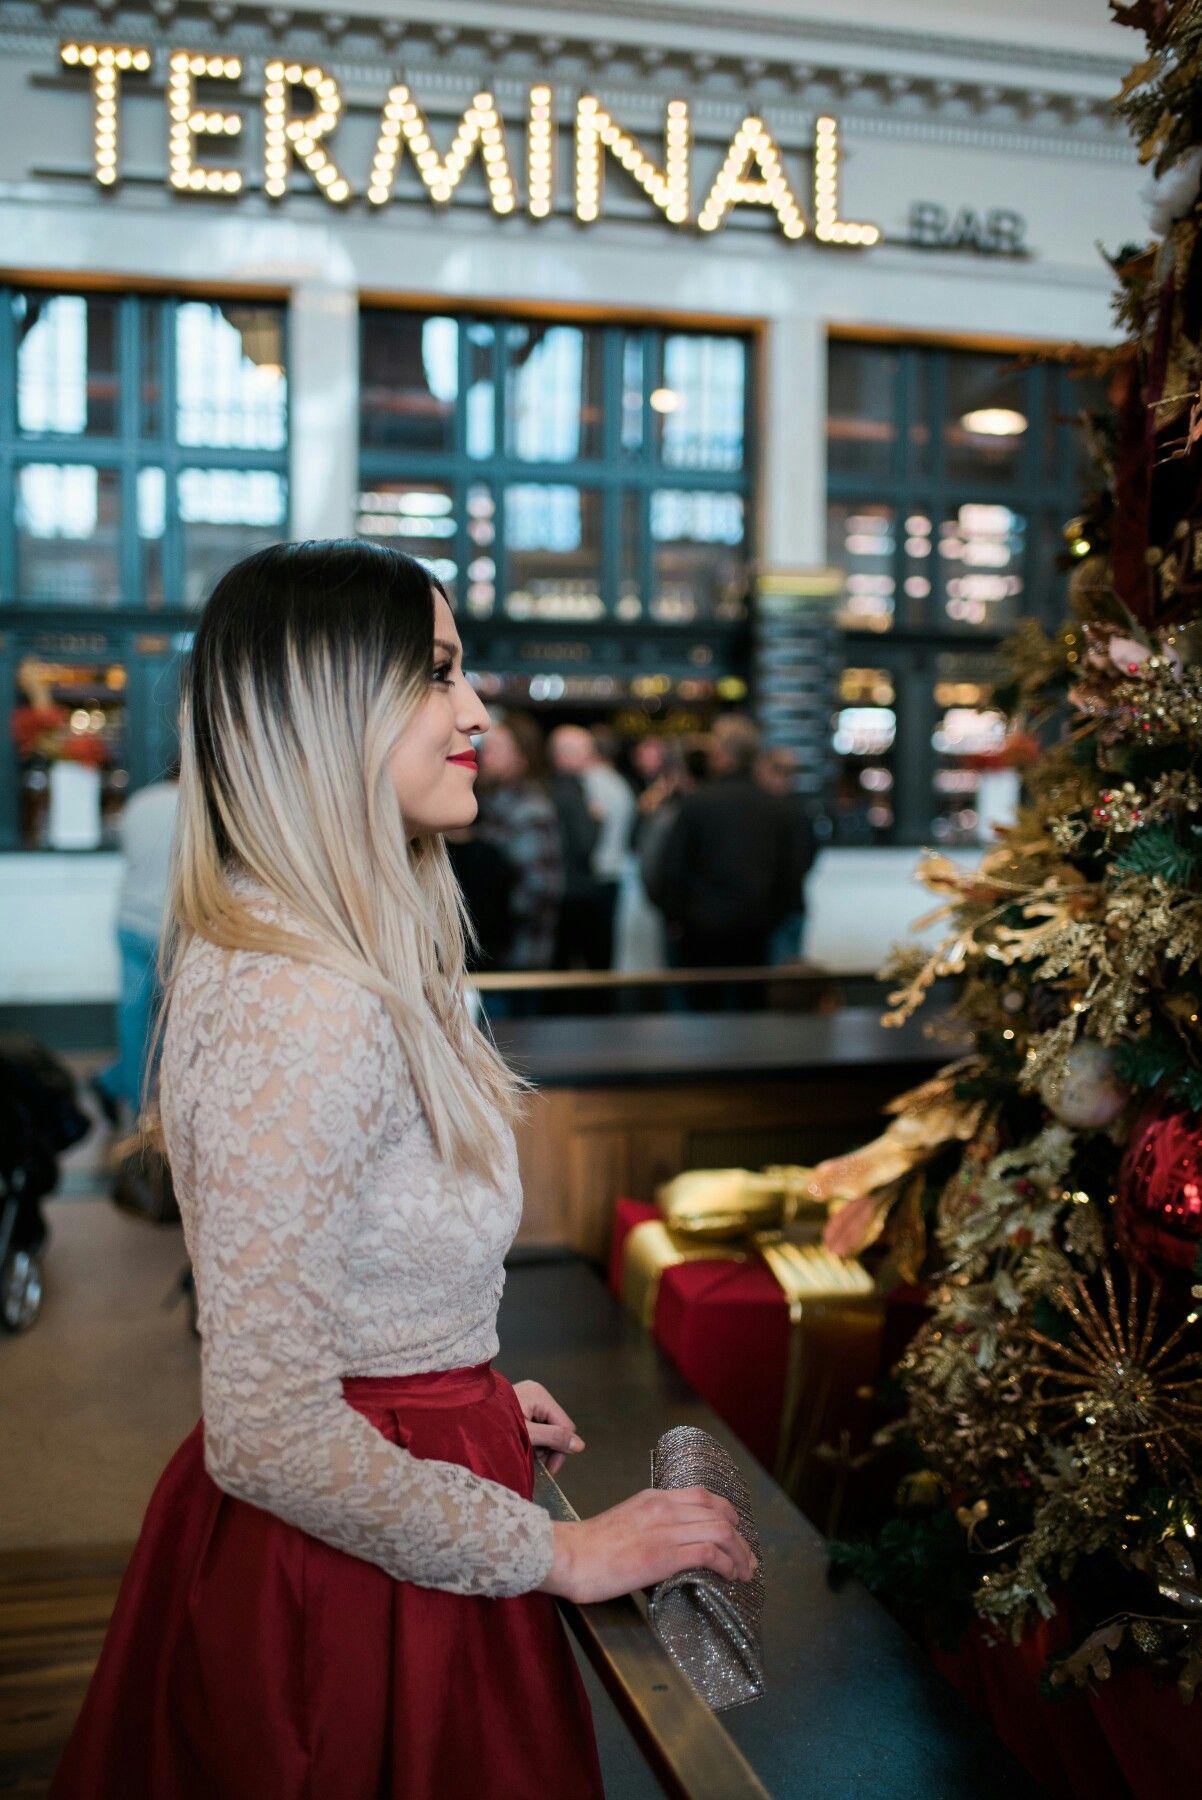 A Wish On Christmas Night Rophowa Christmas Night Red Midi Skirt Outfits